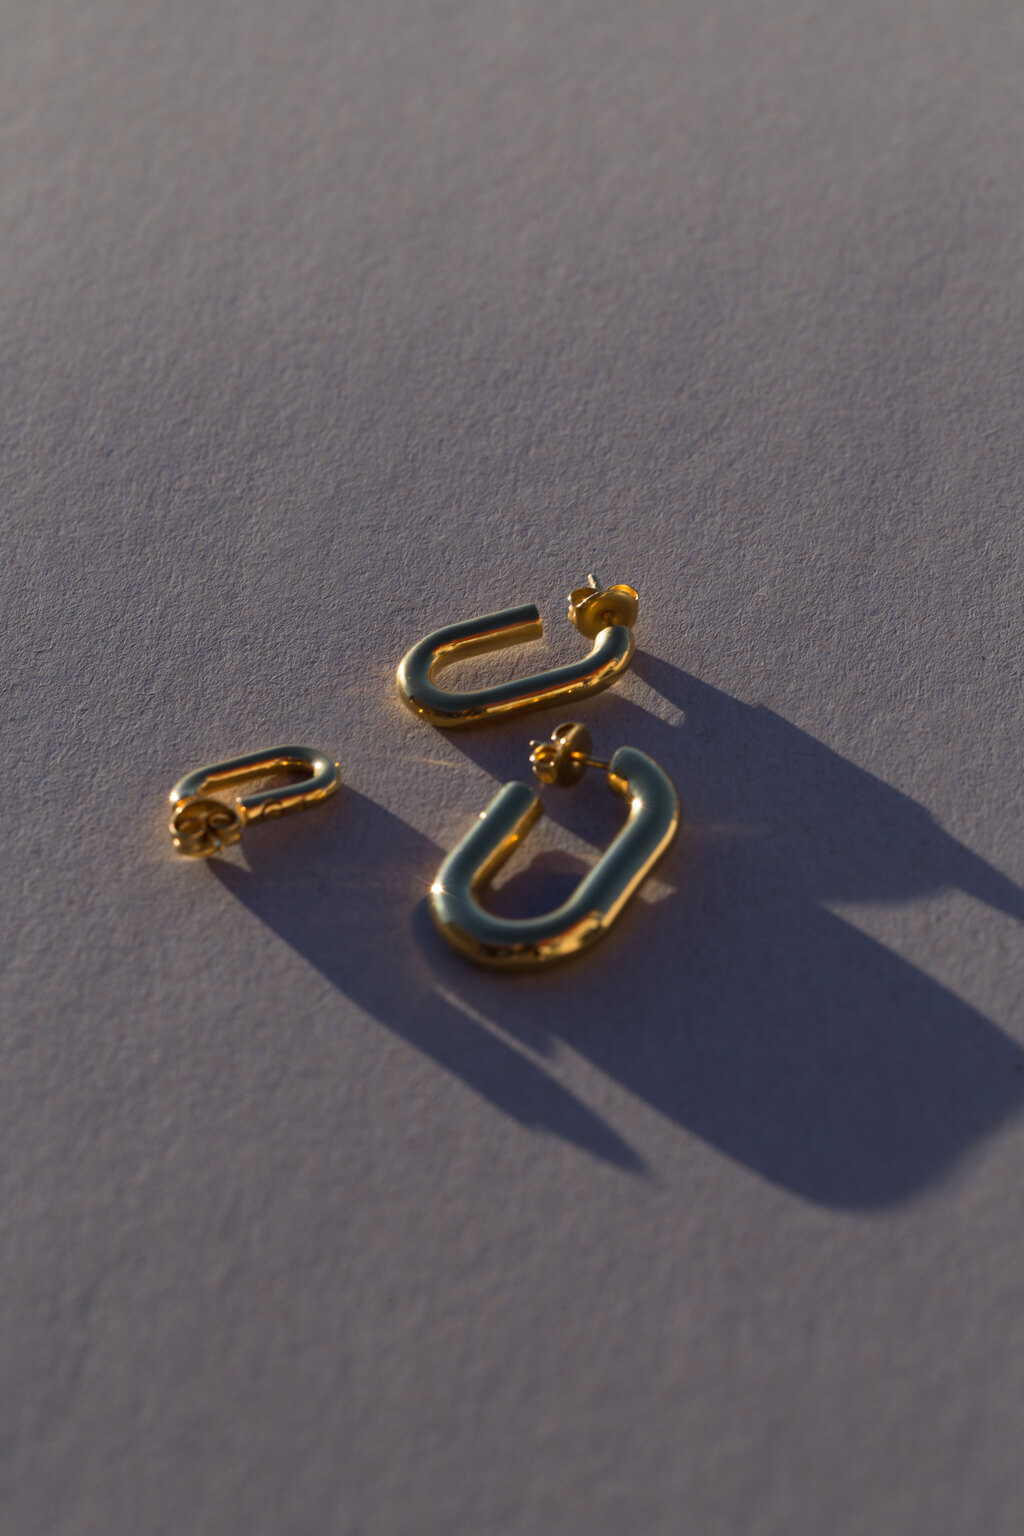 the-xl-golden-link-earring-by-glenda-lopez-alta